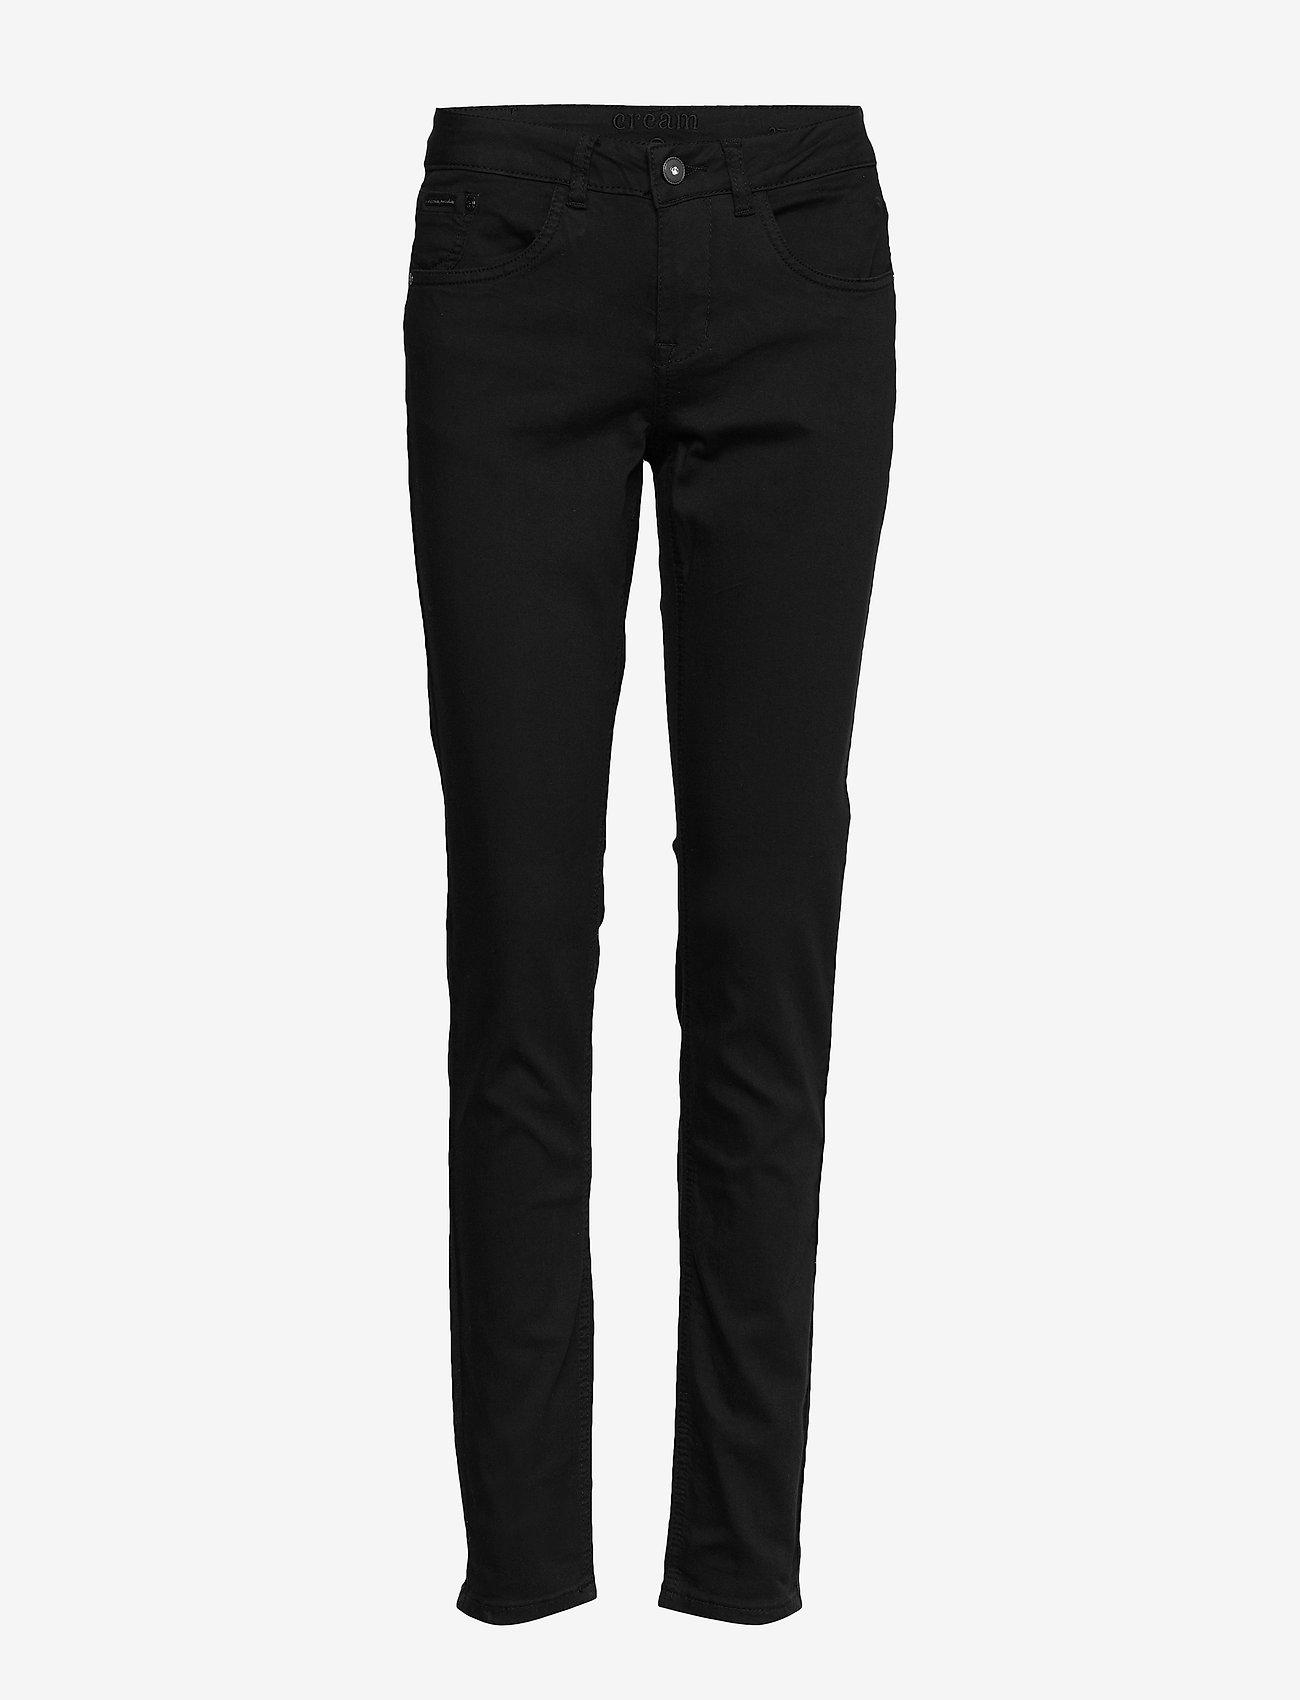 Cream - LotteCR Plain Twill - Coco Fit - skinny jeans - pitch black - 0